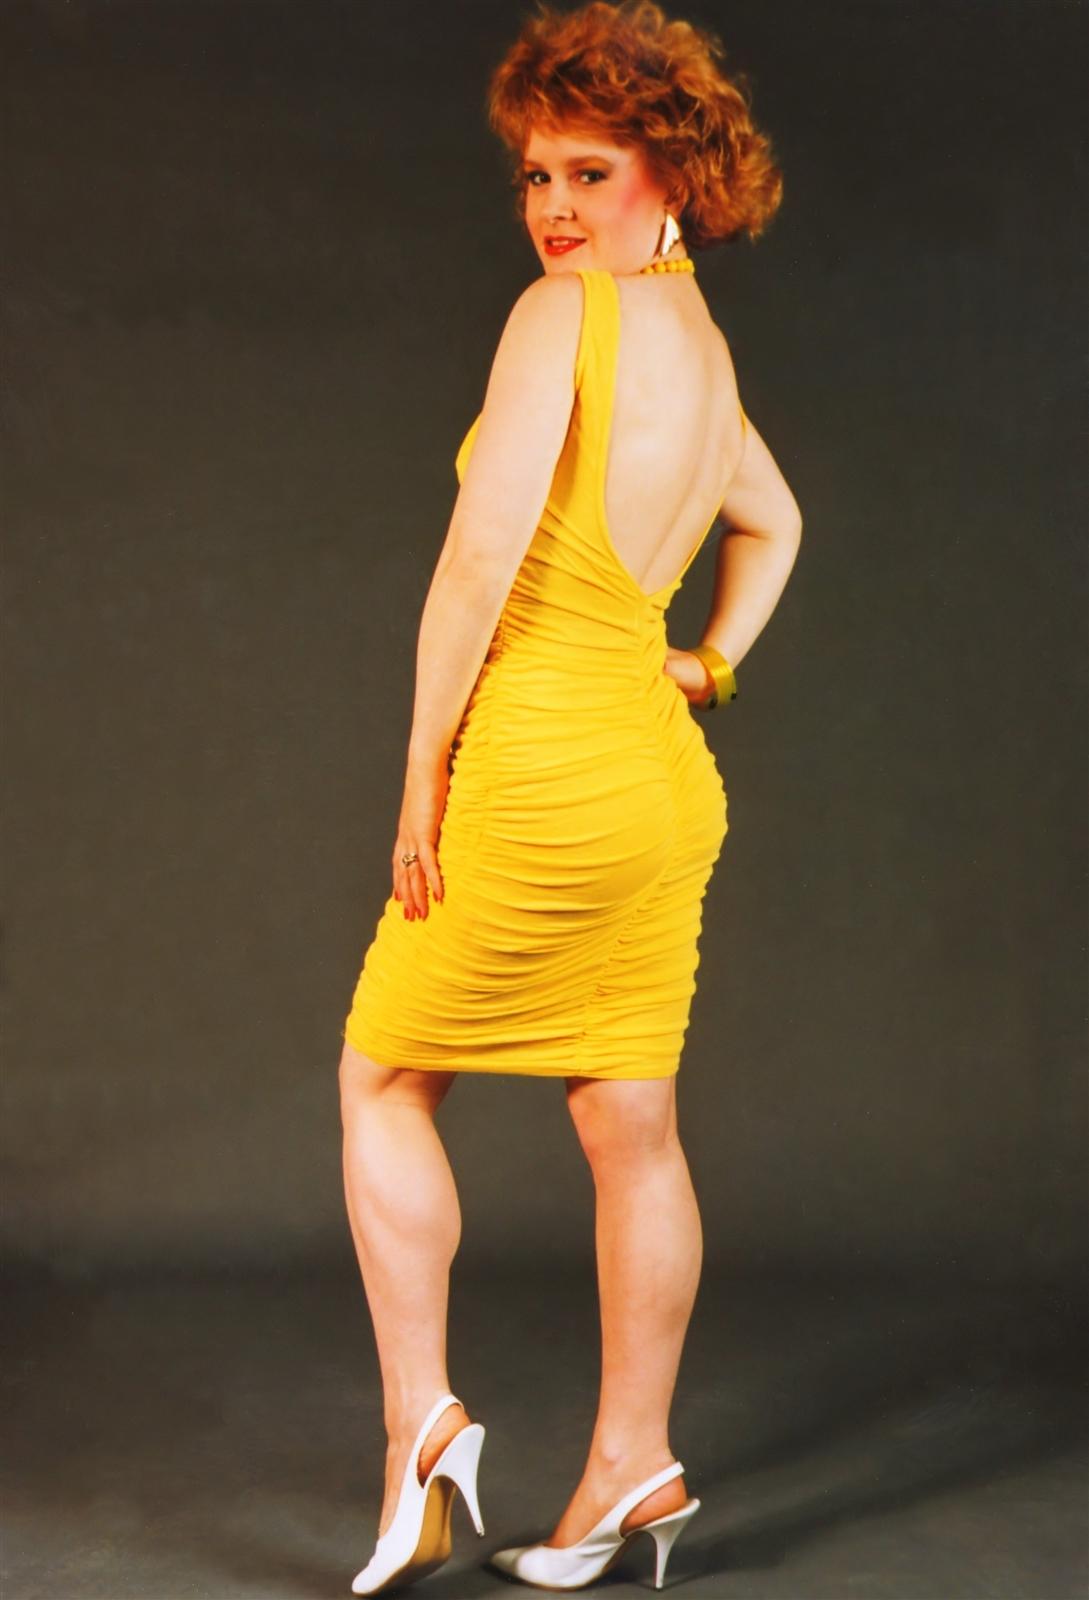 Her Calves Muscle Legs: Muscular Calves Ladies - set 2